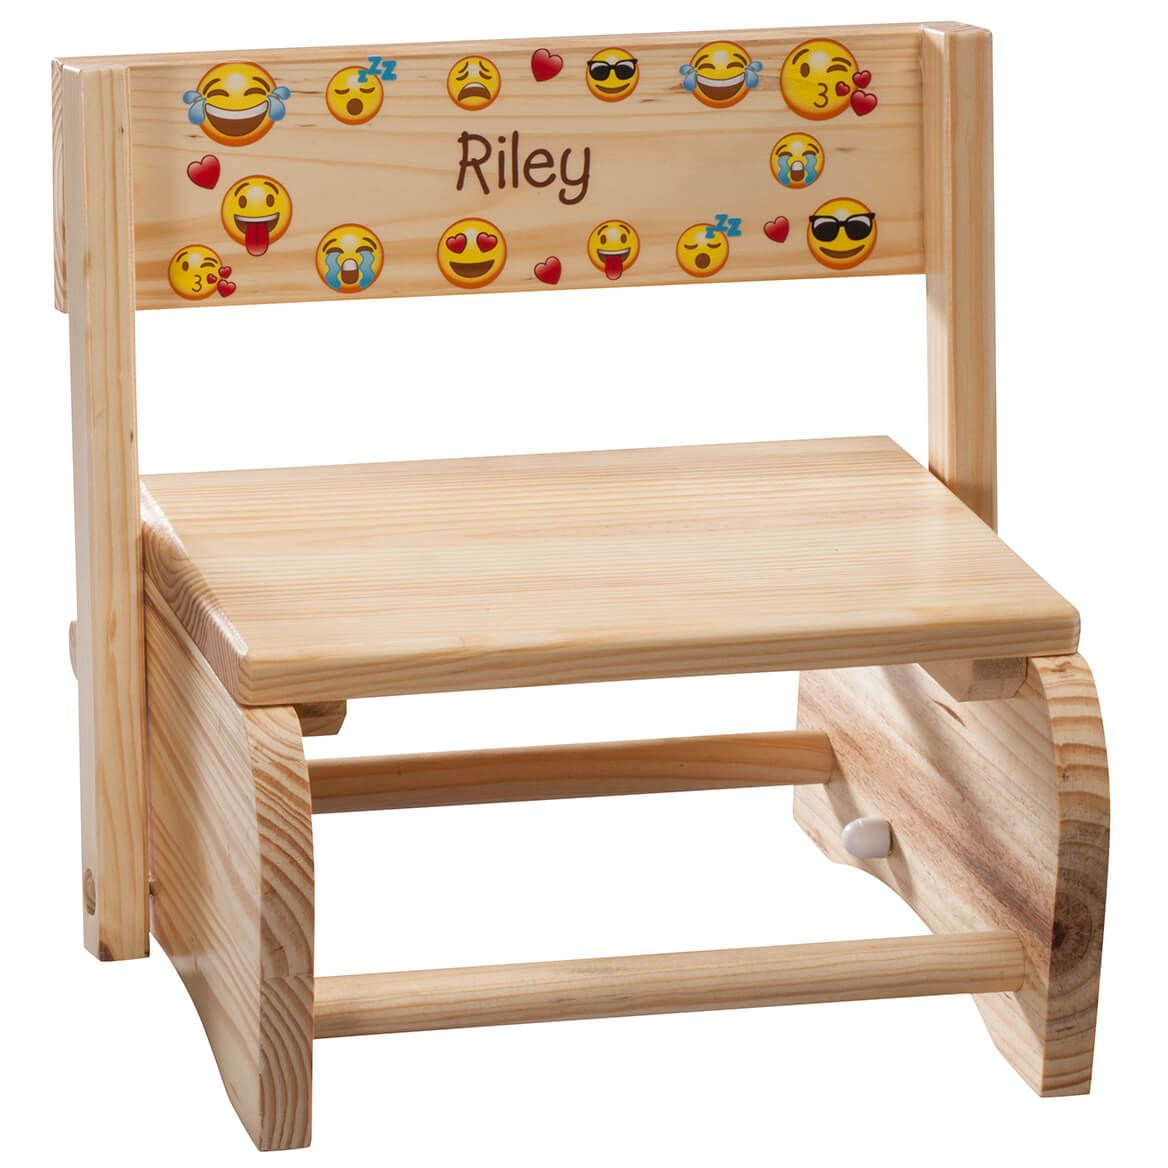 Personalized Children's Emoji Step Stool-365664